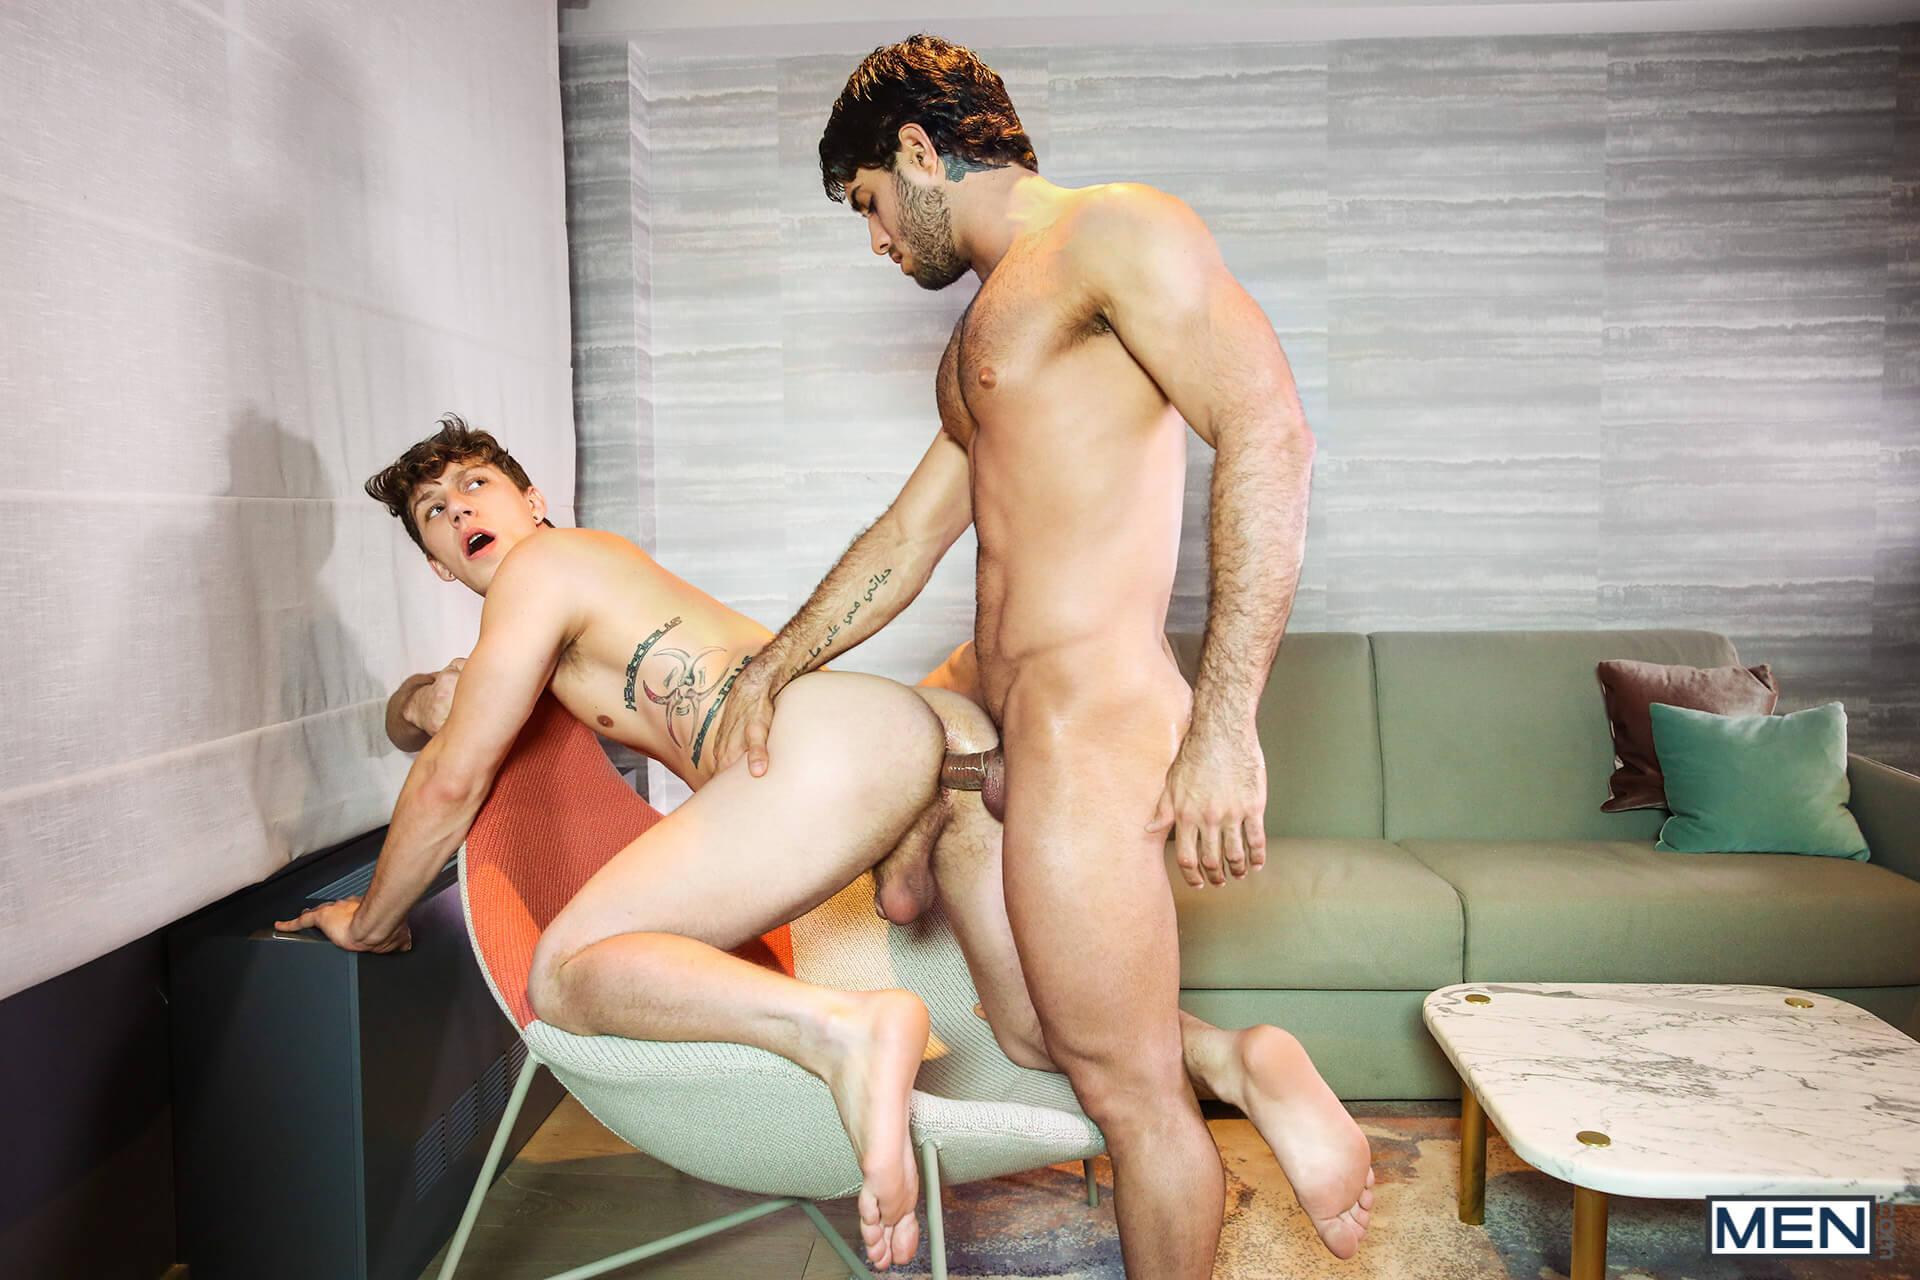 Diego Sans fuck Paul Canon gay hot dudes guys men porn stealth fuckers